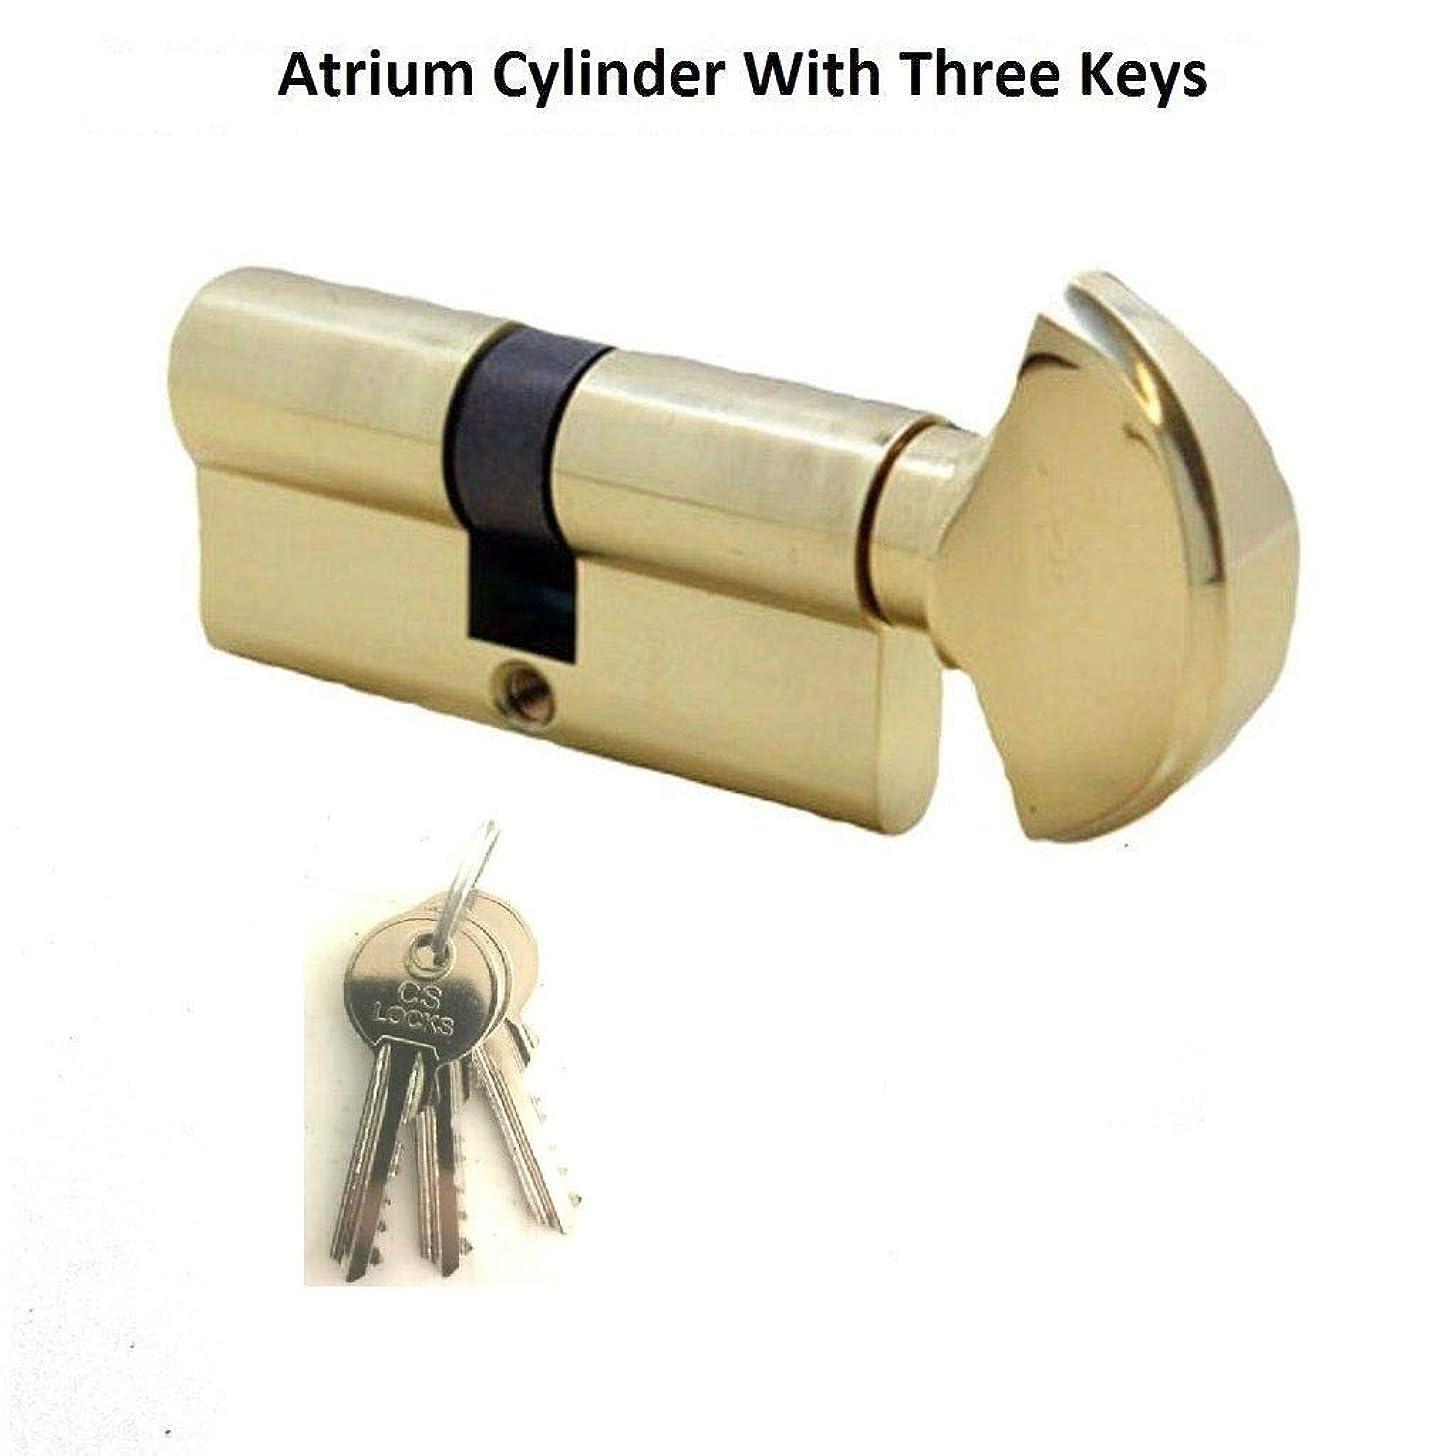 Brass Atrium Lock Single Profile Cylinder with 3 Keys (2-1/2